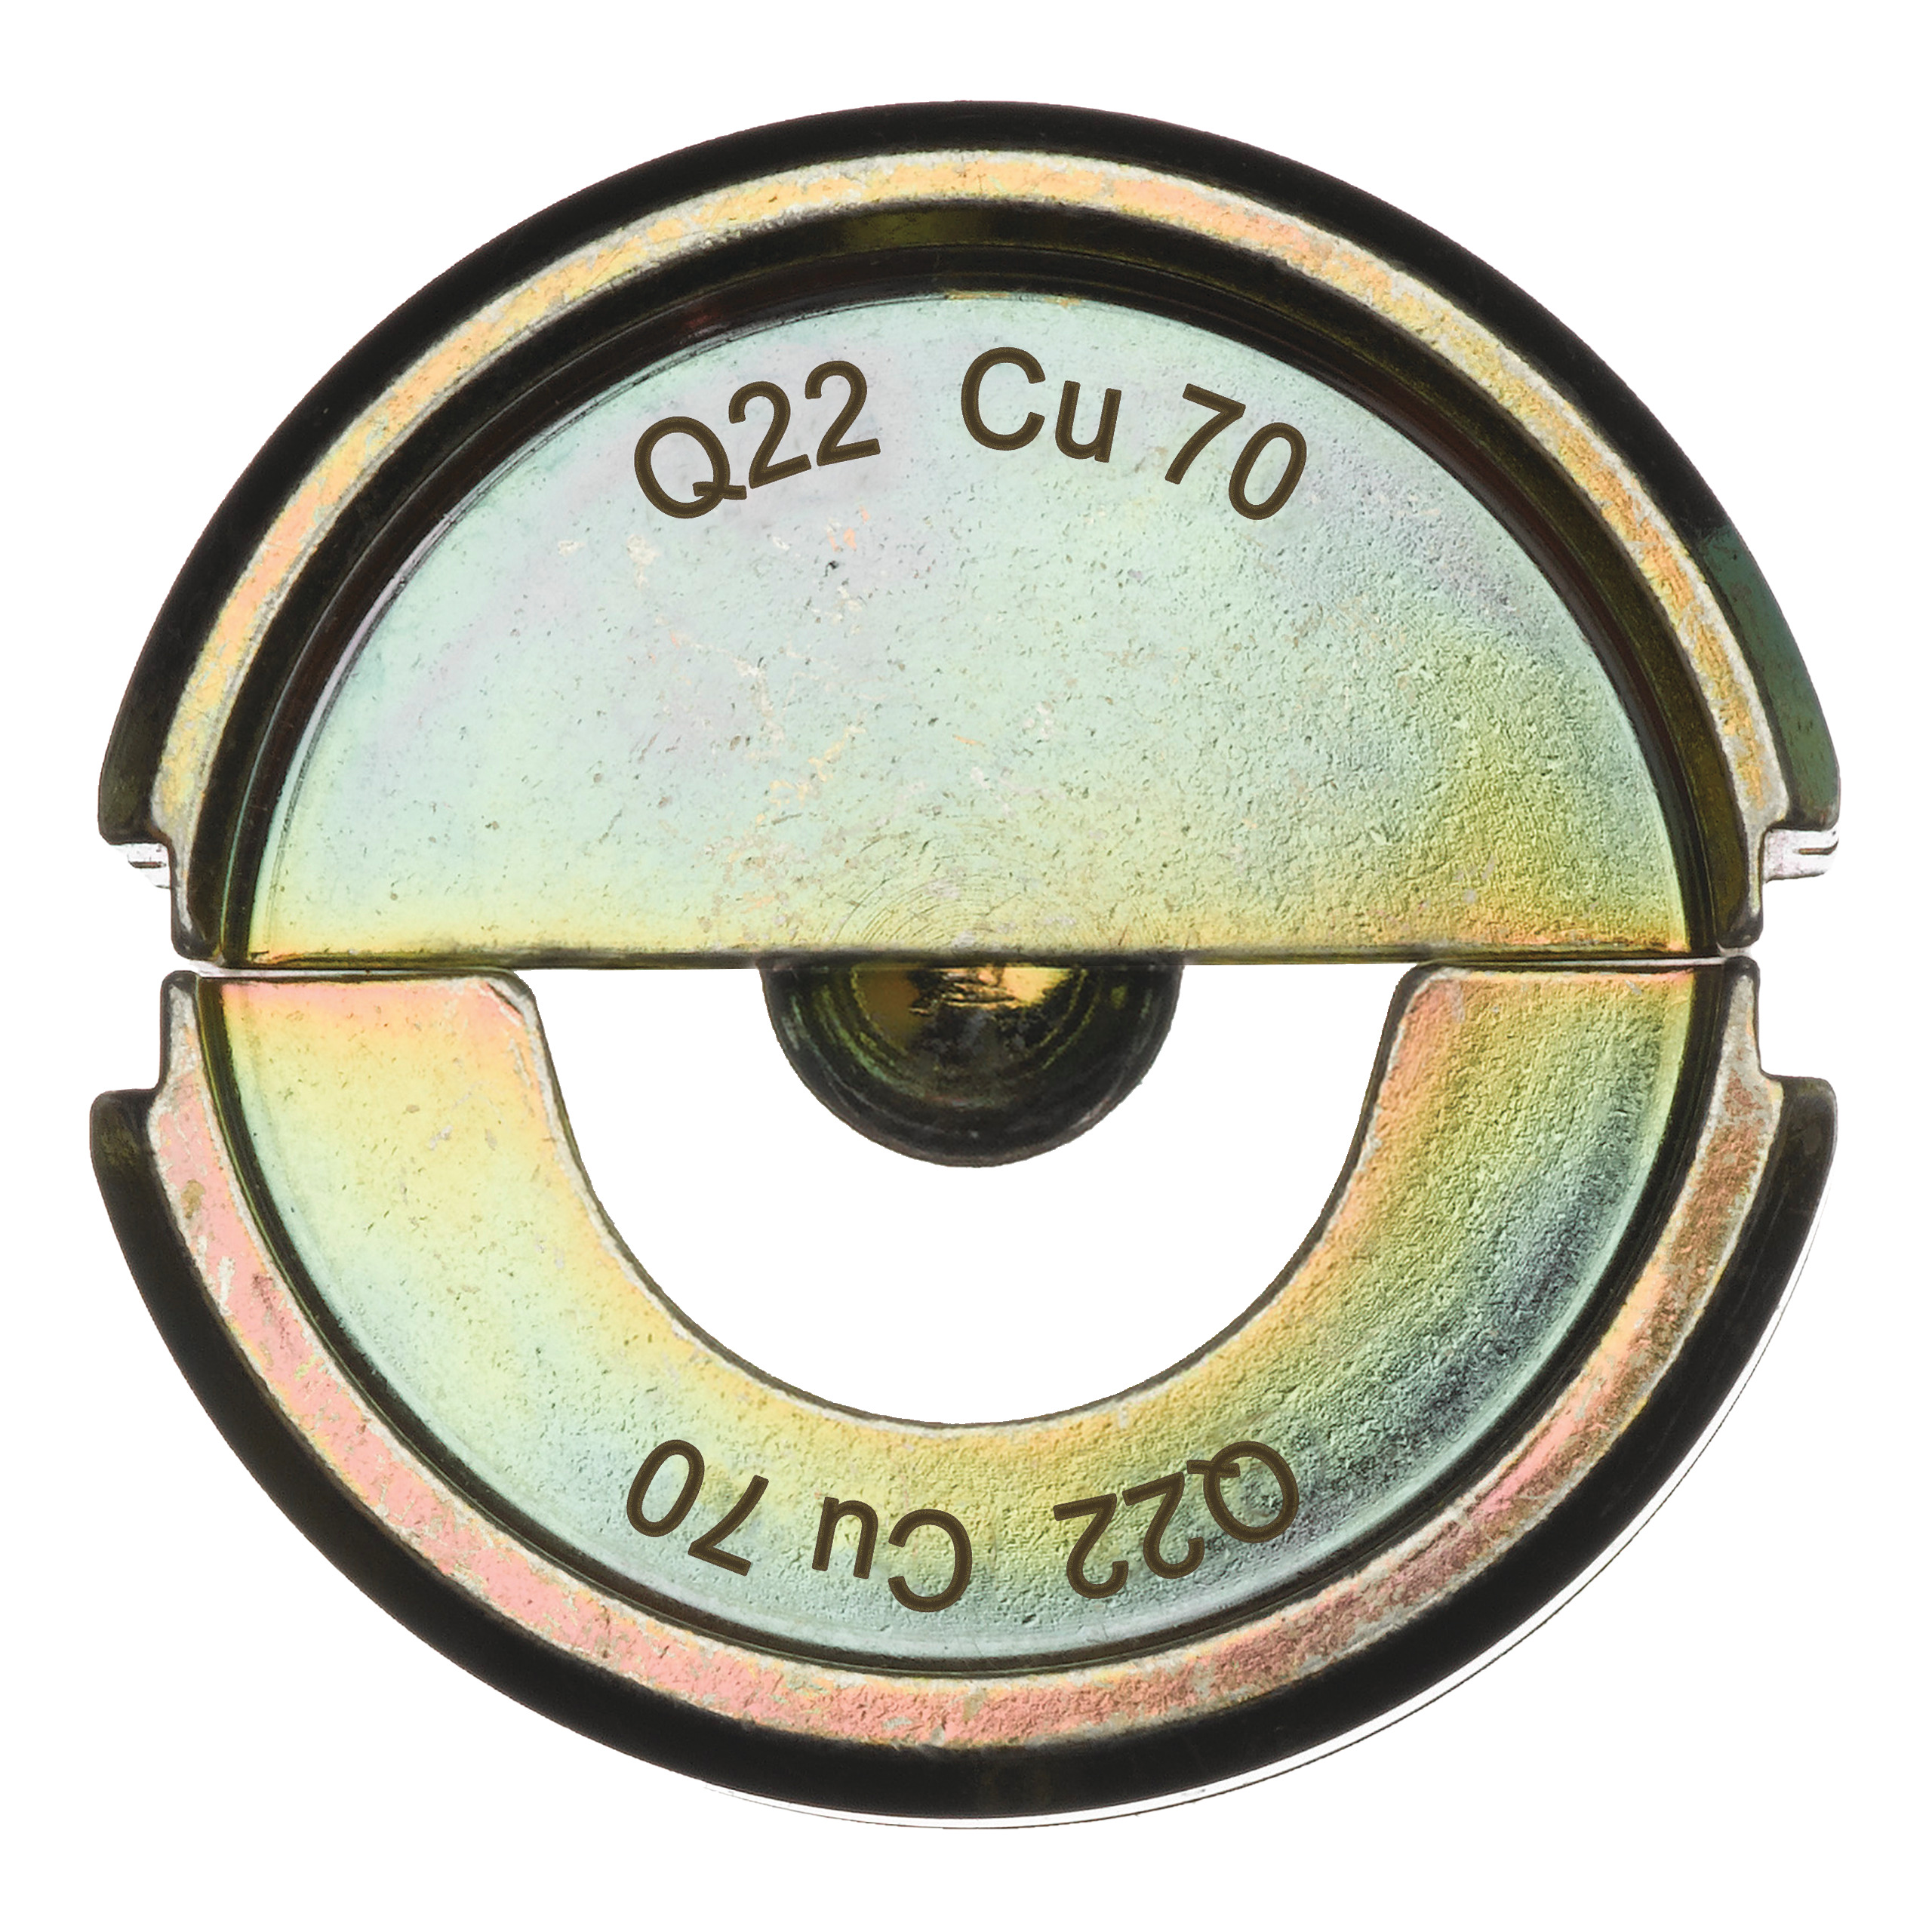 Krimpovací čelisti  Q22 CU 70